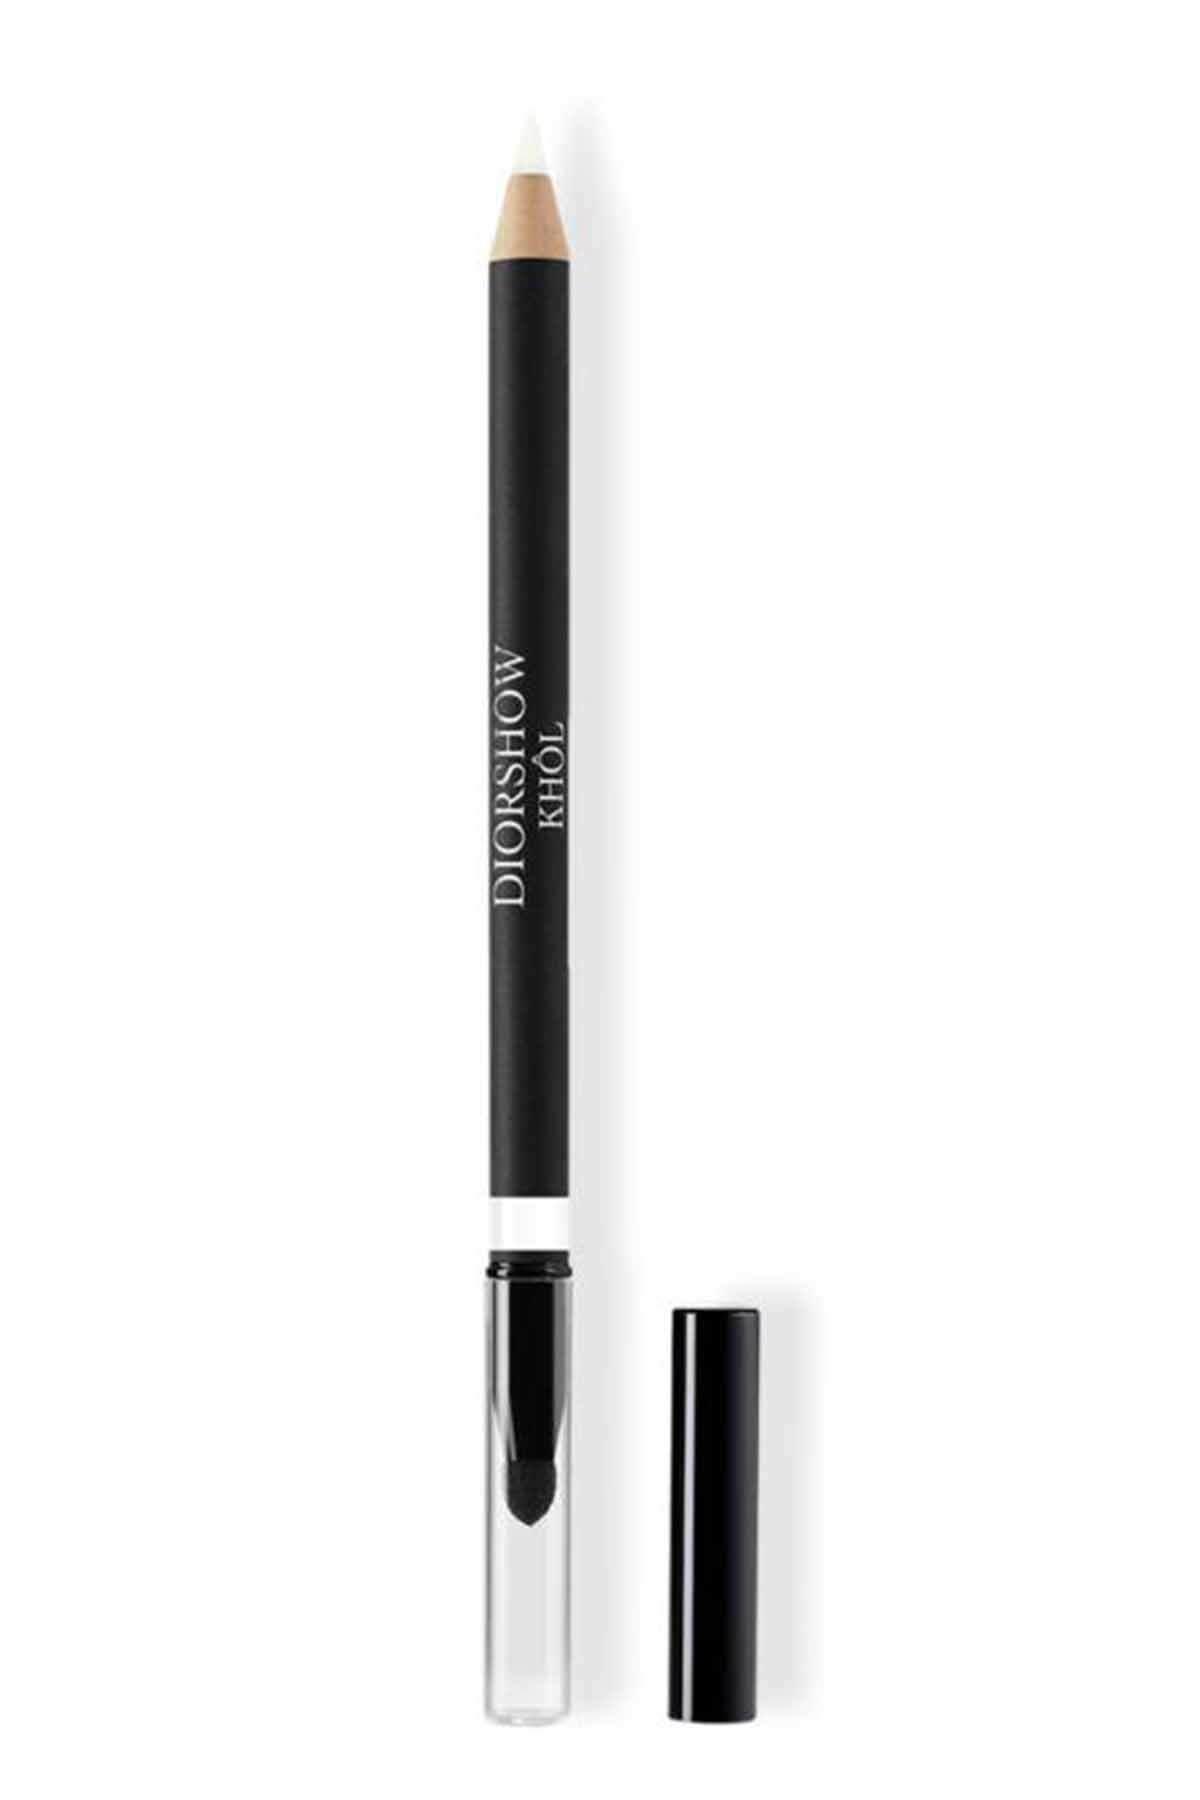 Dior Suya Dayanıklı Eyeliner - Diorshow Khol Waterproof Eye Pencil 3348901329477 1